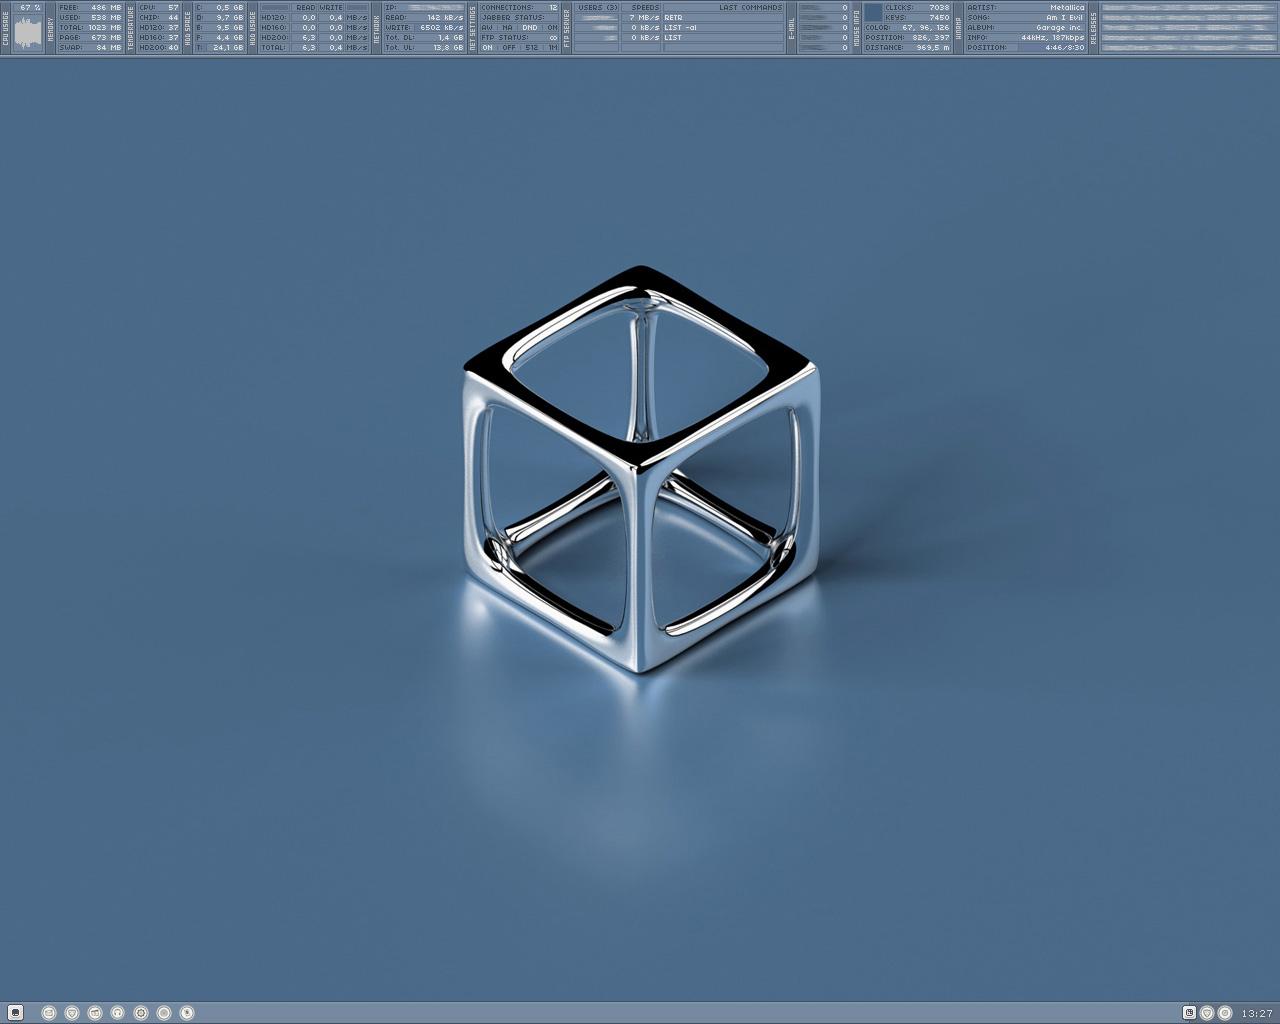 Title: My current desktop